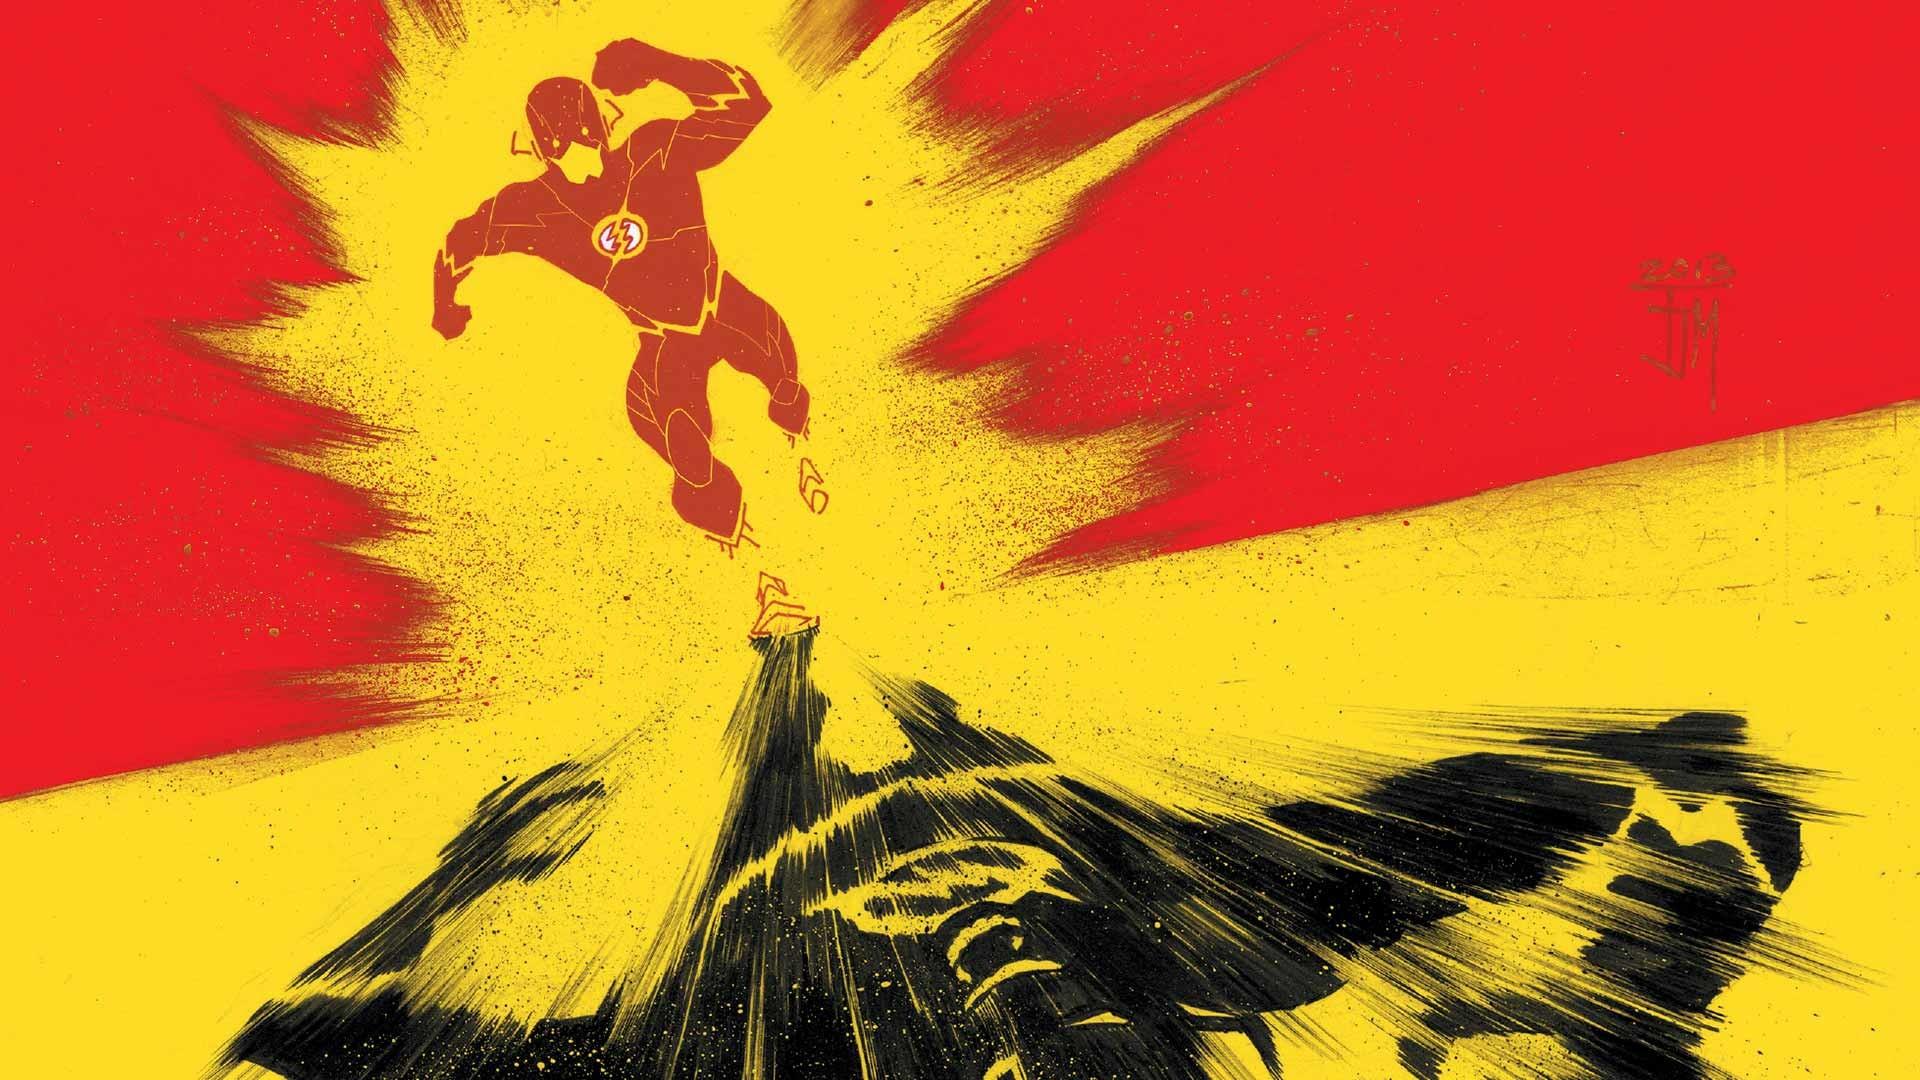 Reverse Flash The Flash Vol 4 Reverse dc